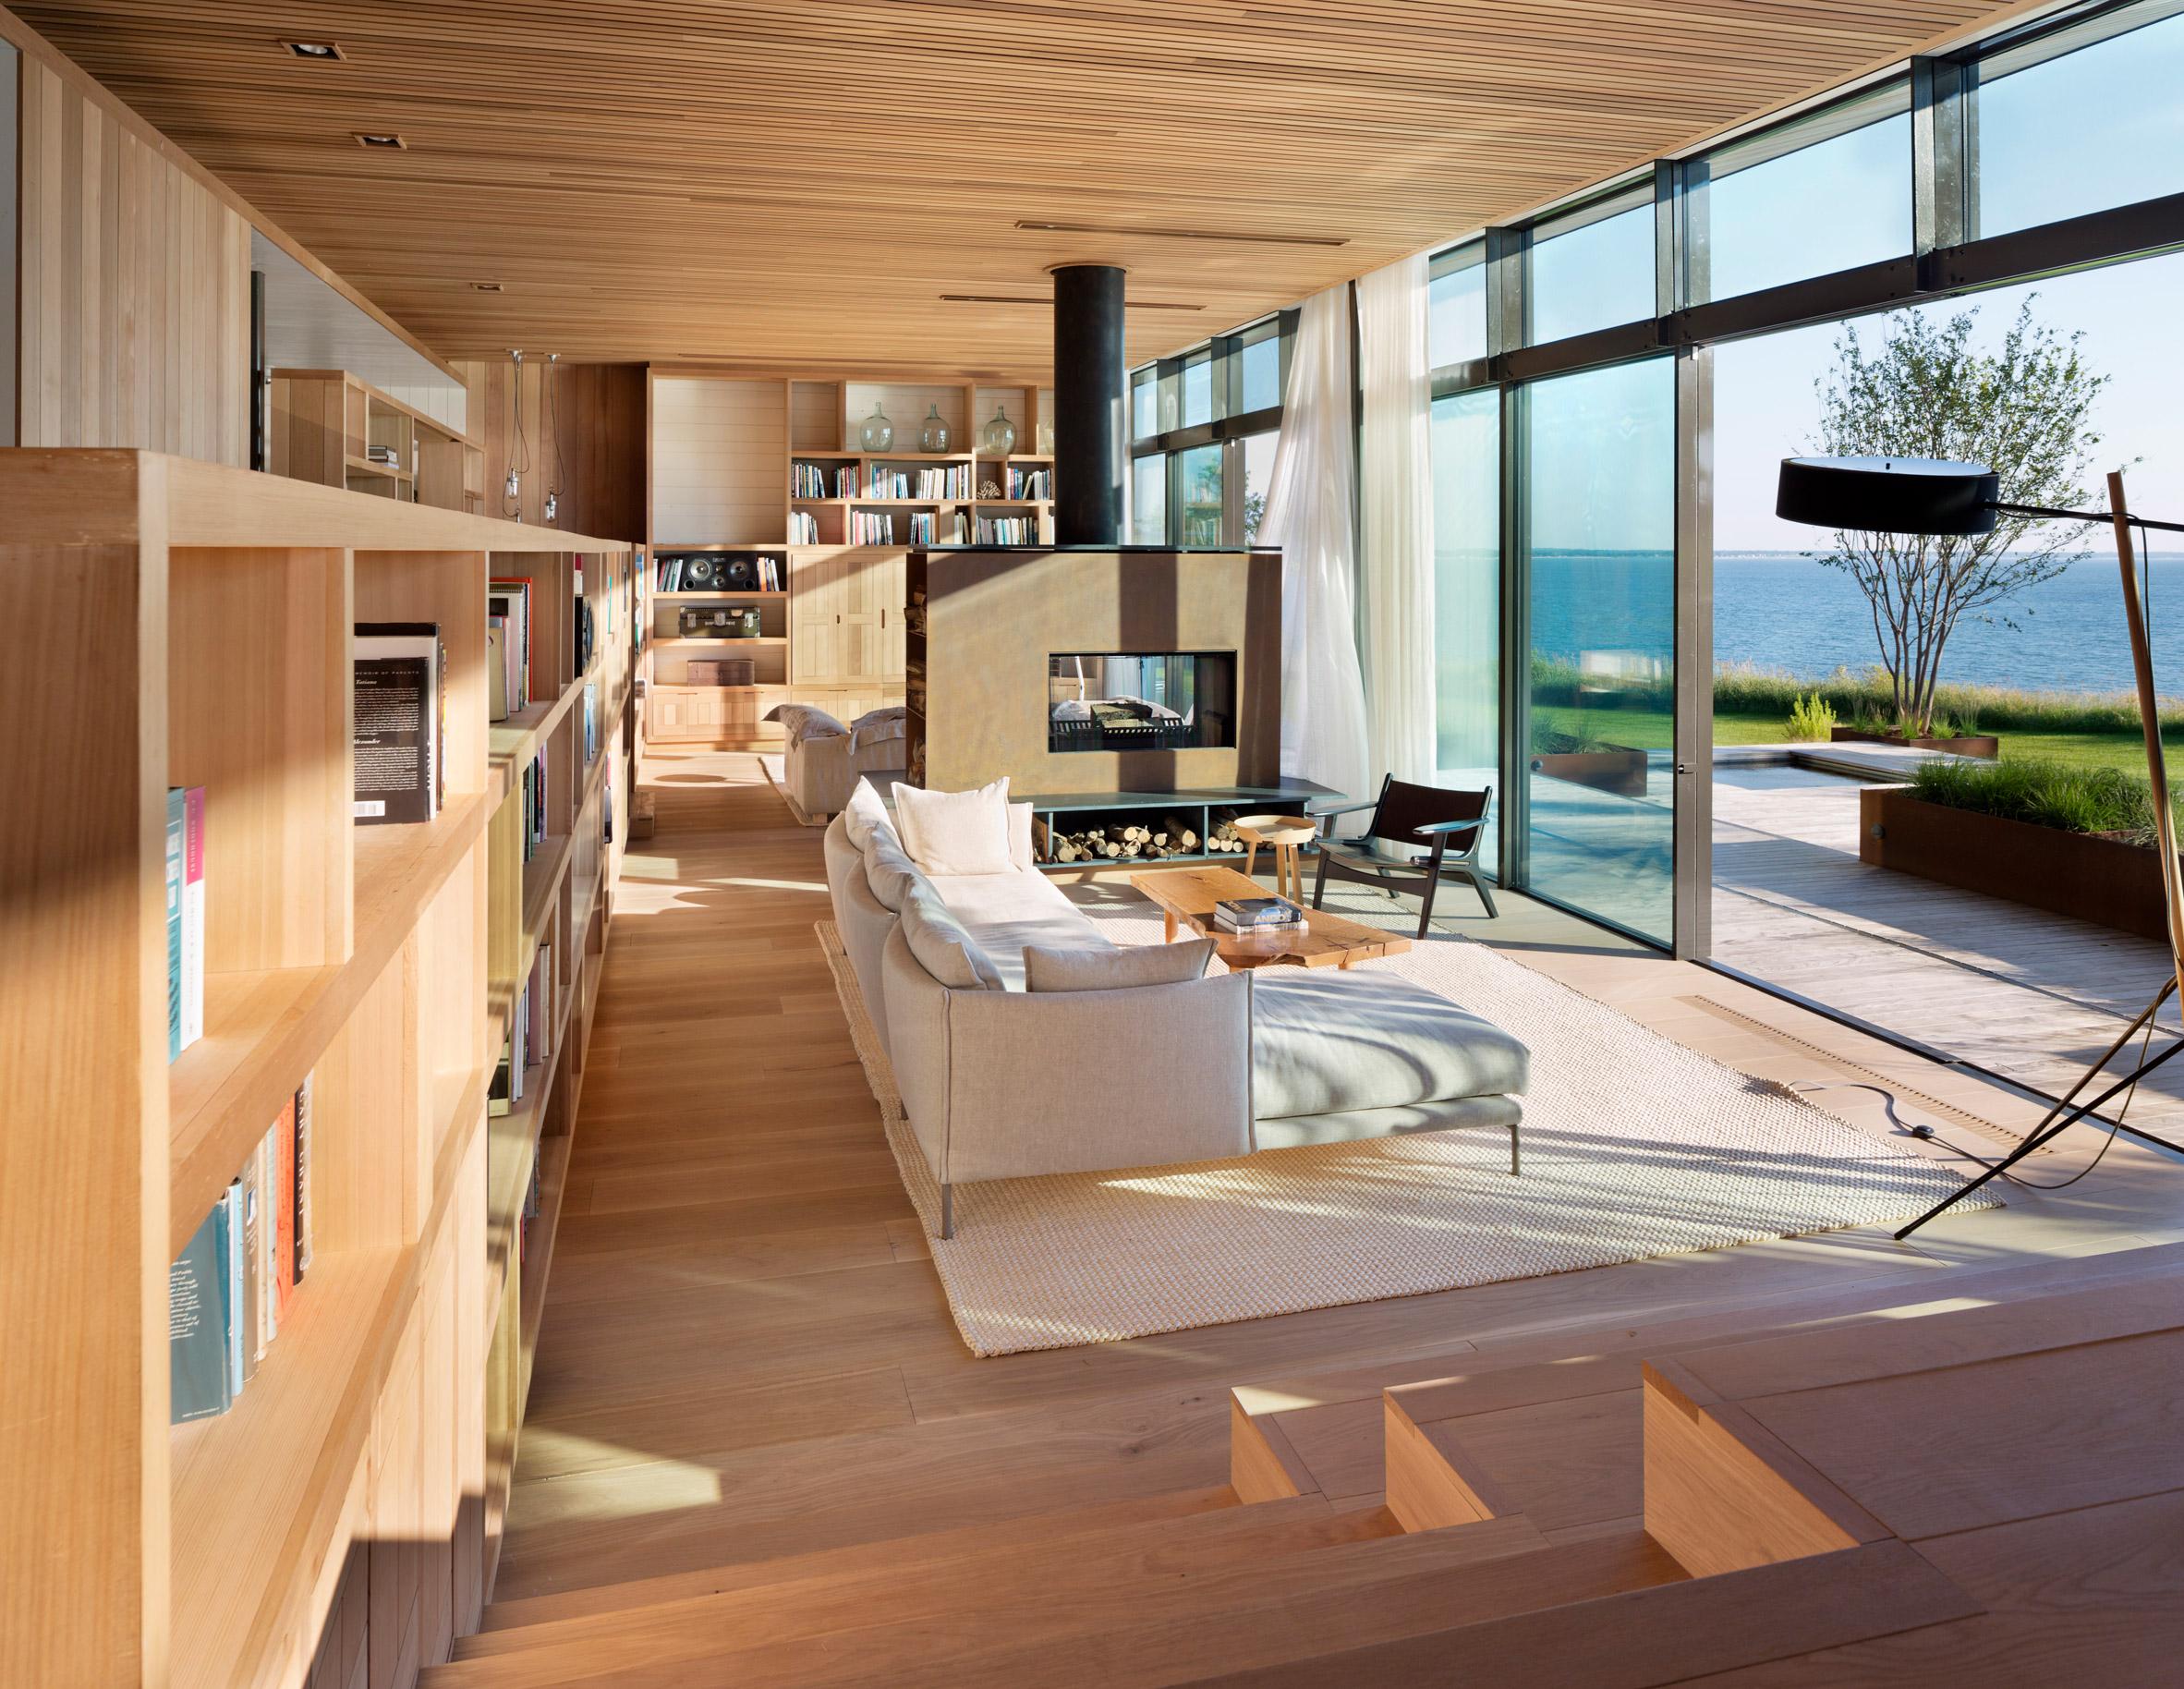 peconic-house-mapos-studio-hamptons-long-island-new-york_dezeen_2364_col_16.jpg